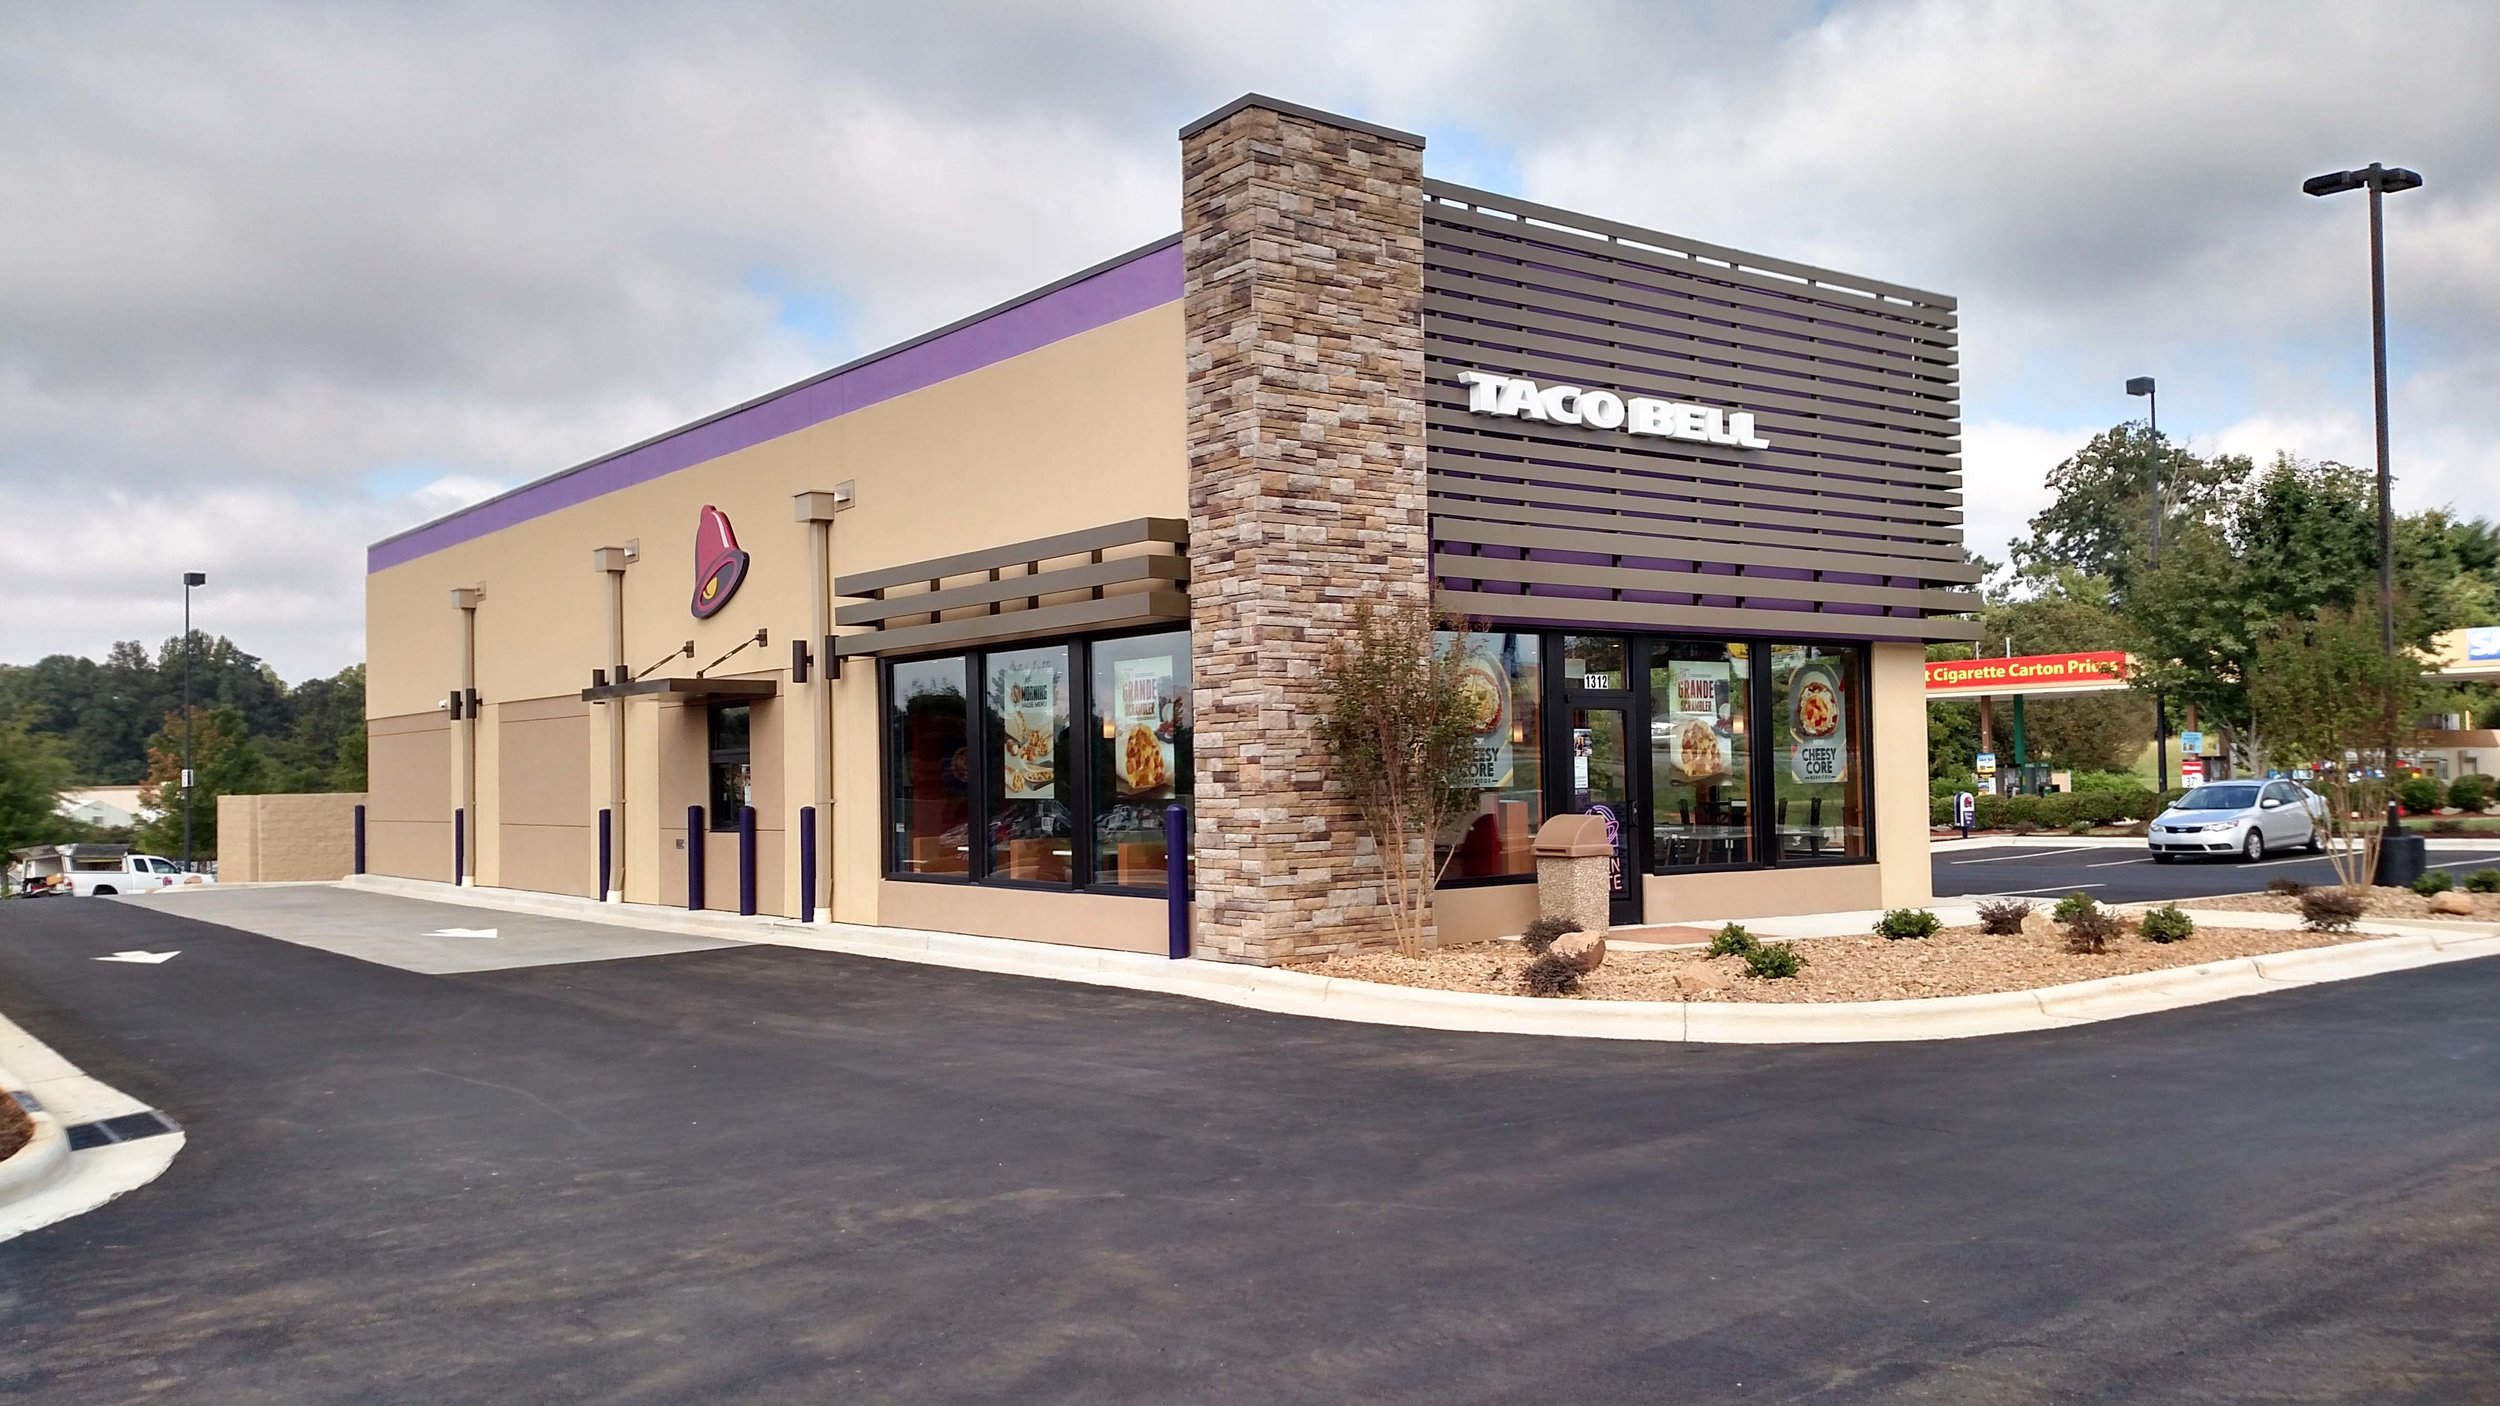 Sela Building Corporation Commercial General Contractor for Quick Serve Restaurants.